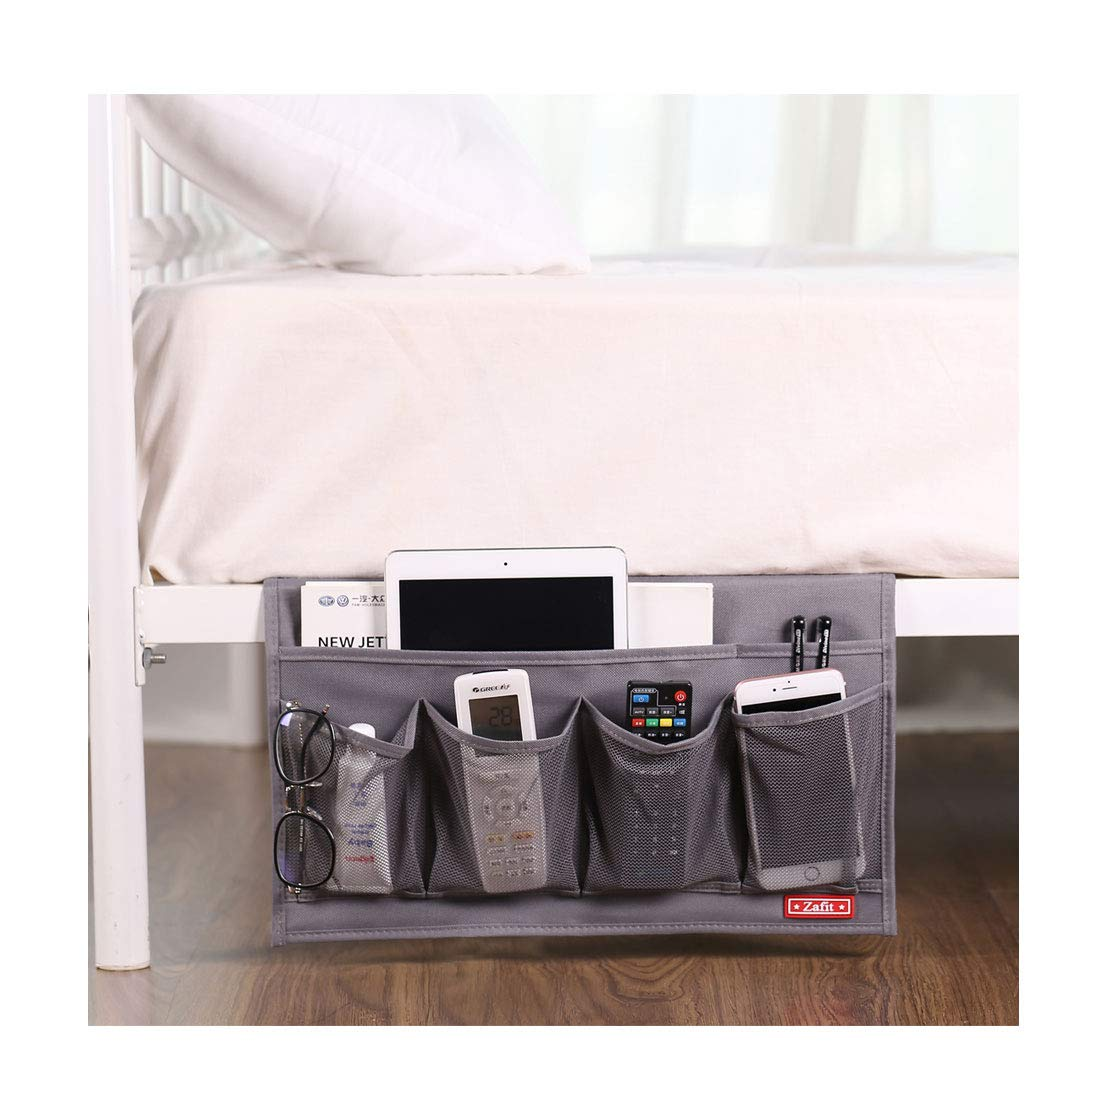 Zafit 6 Pockets Bedside Storage Organizer, Table cabinet Storage Organizer Bedside Organizer Caddy for Remotes Phone Glasses (Grey) by Zafit